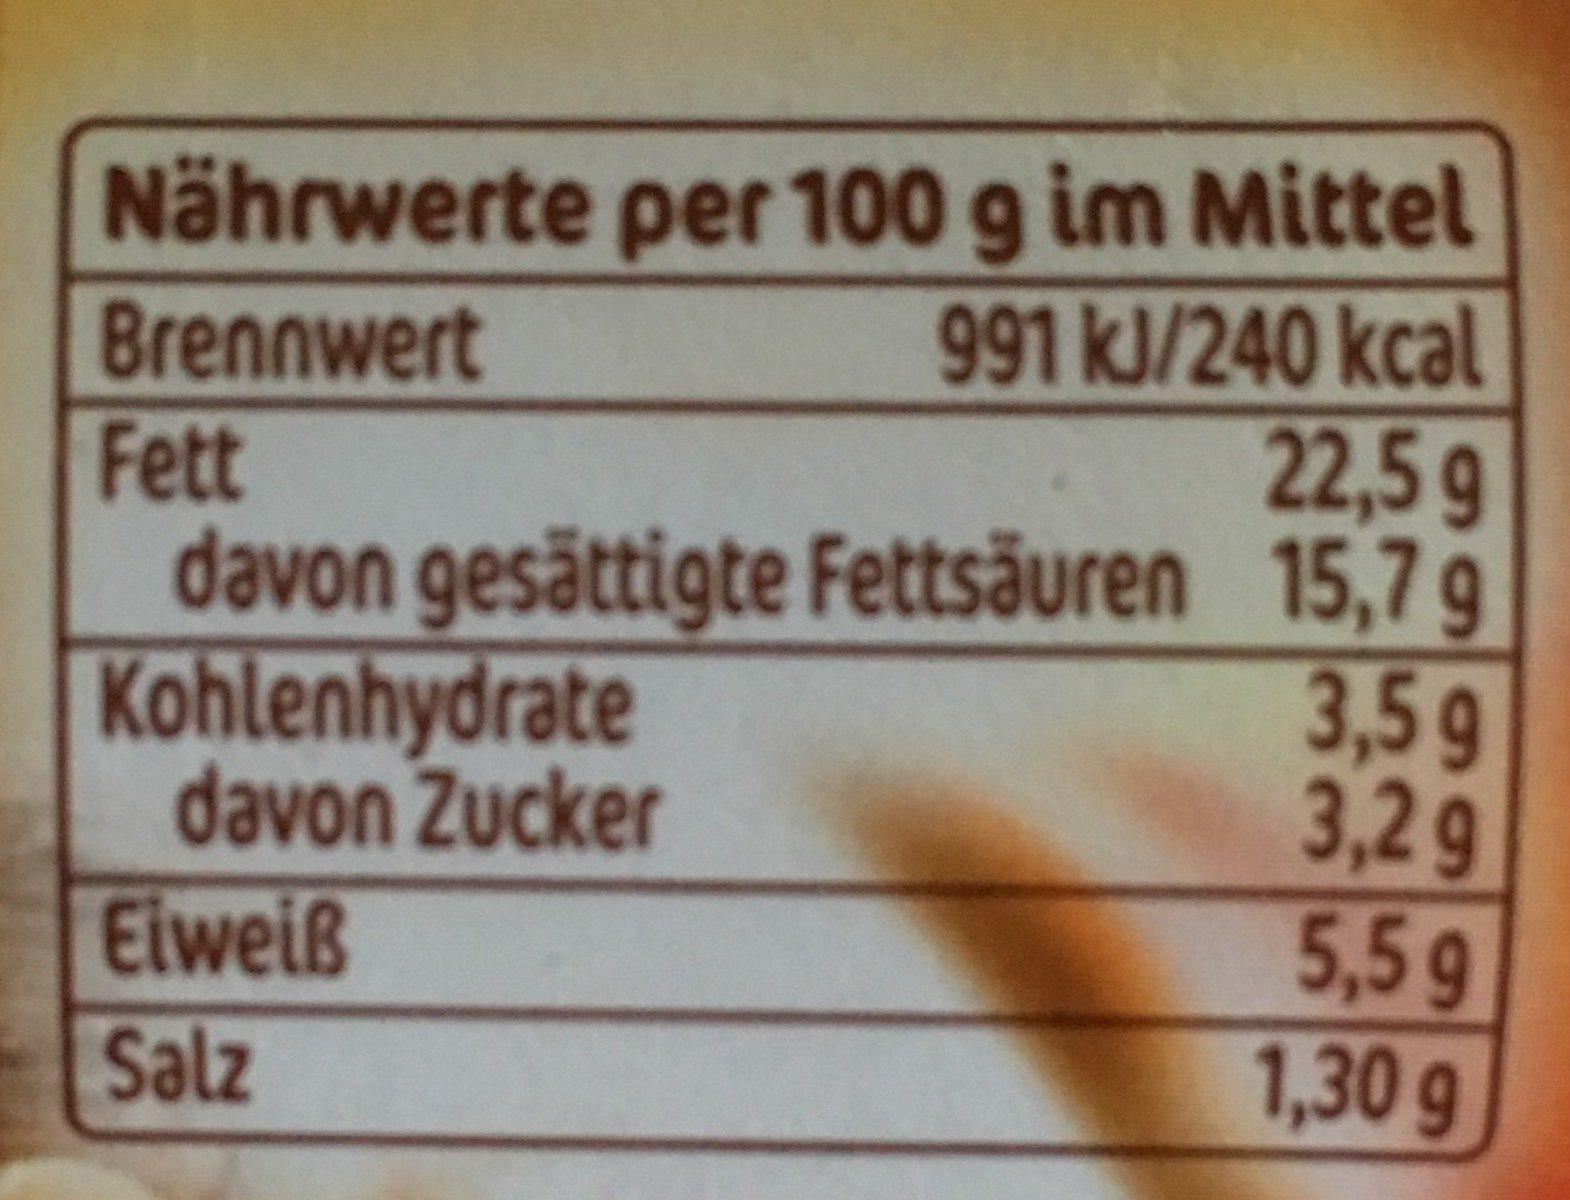 Frischkäse Meerrettich - Informations nutritionnelles - fr